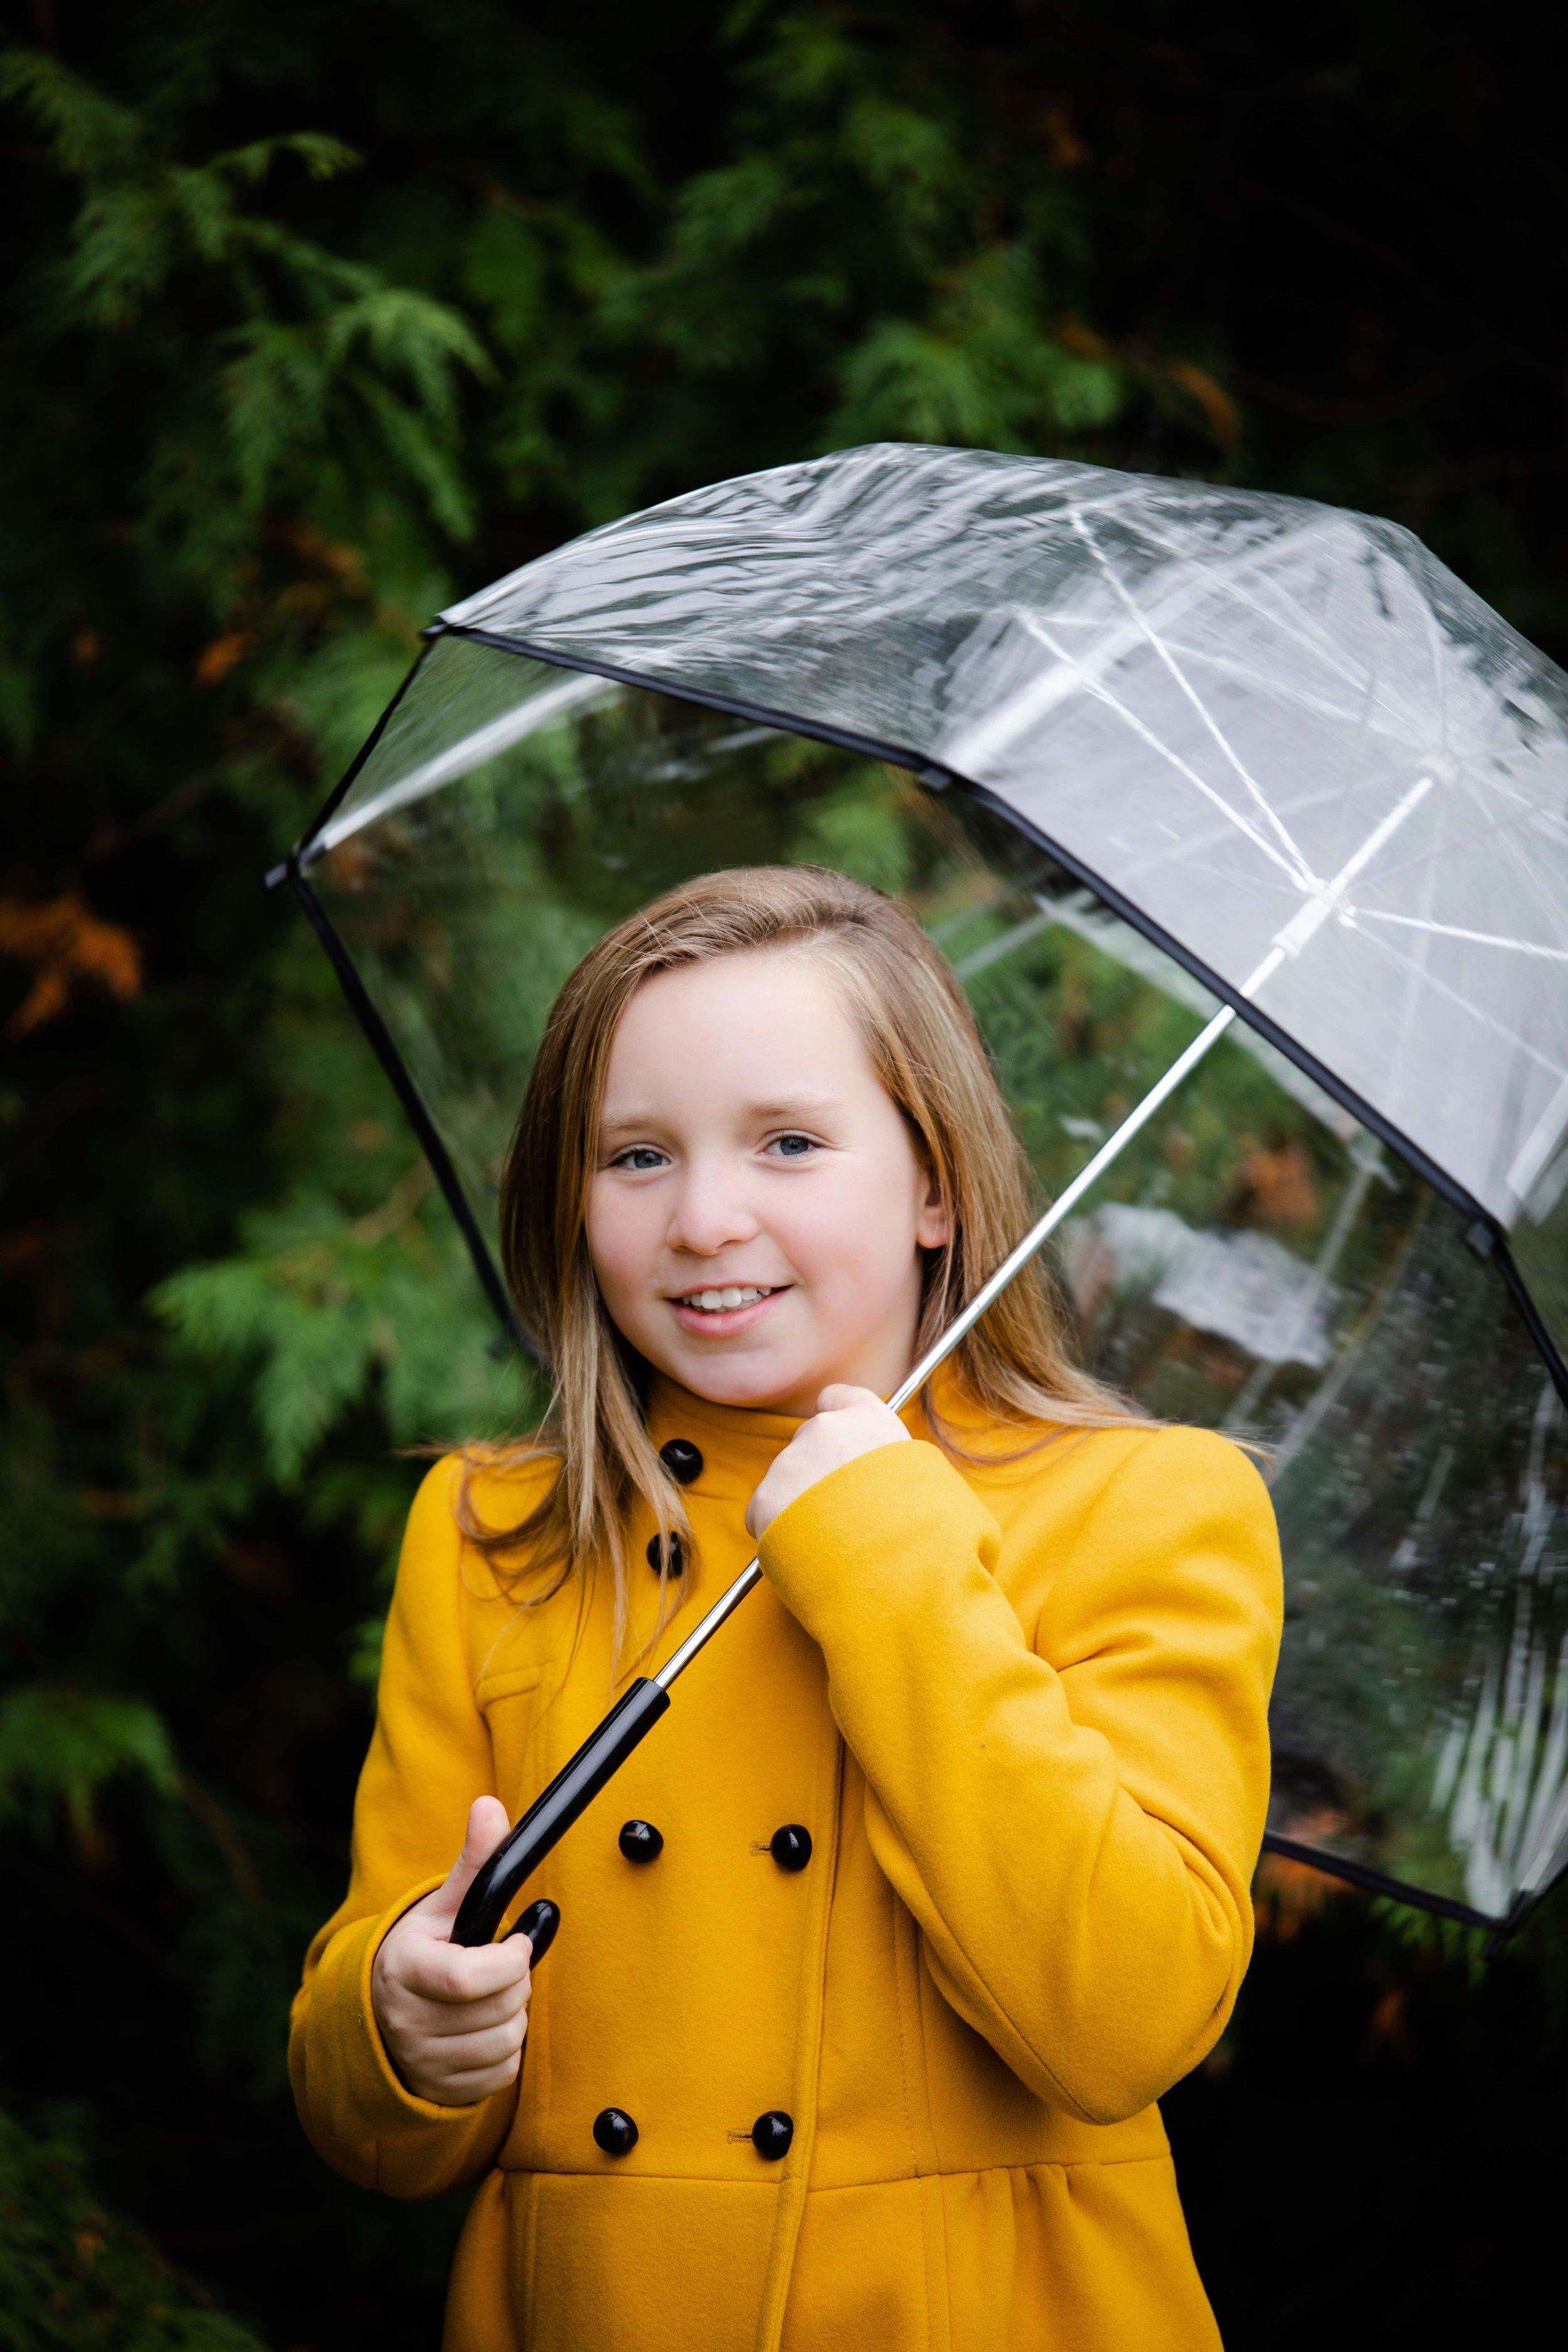 Jodie-Aldred-Photography-Chatham-Kent-Elgin-Middlesex-London-Ontario-Farm-Family-Rain.jpg